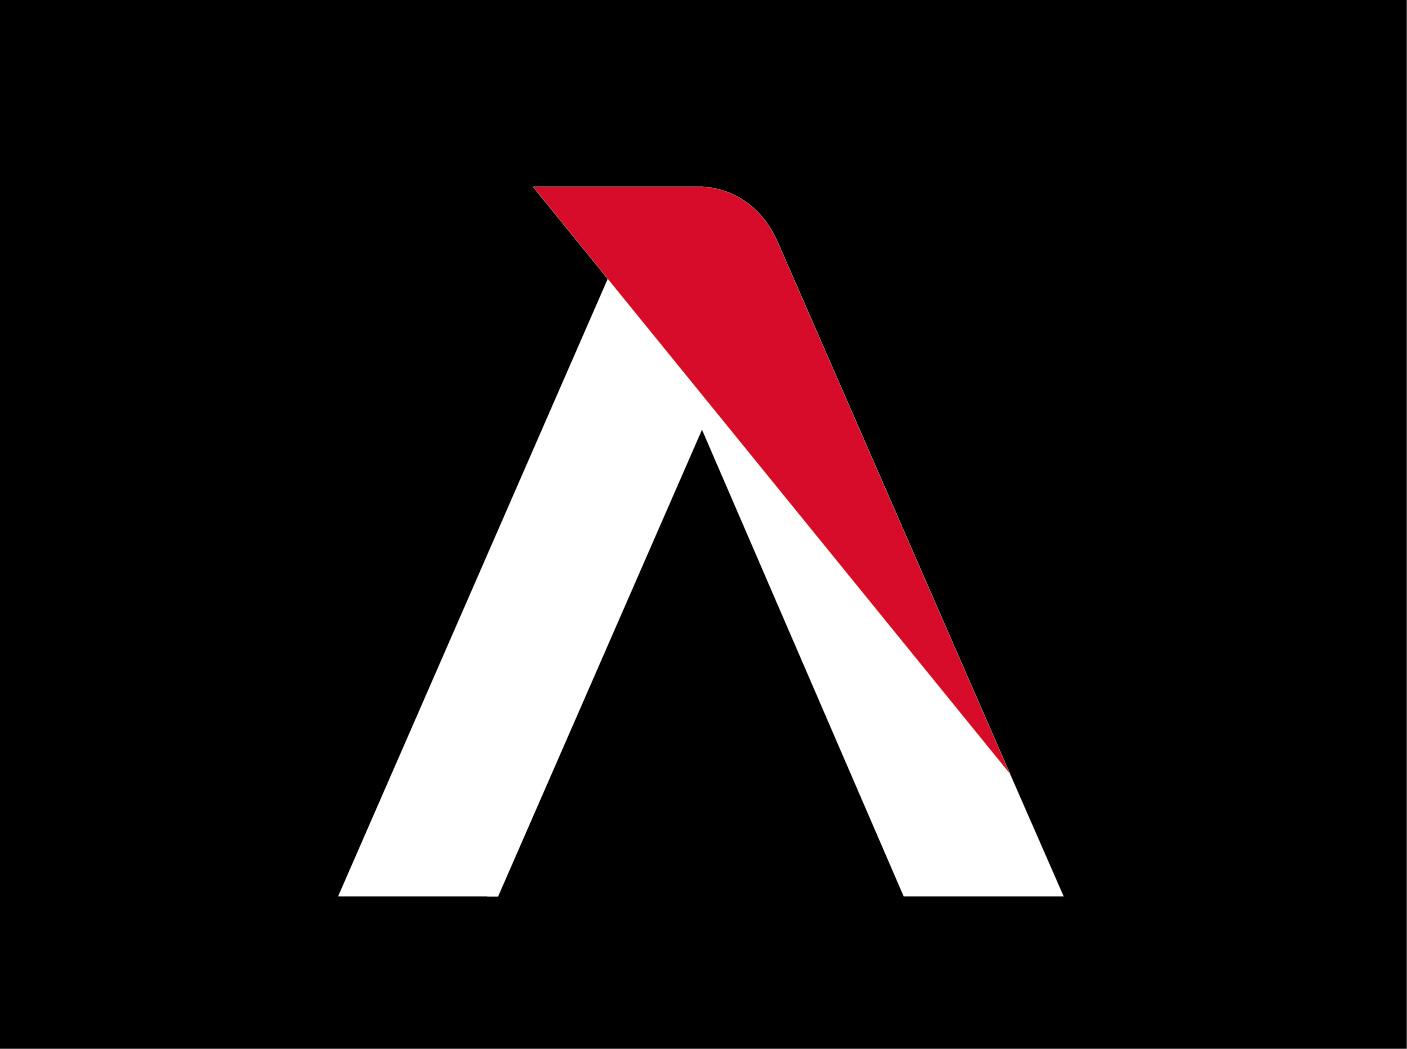 A Letter Logo Png